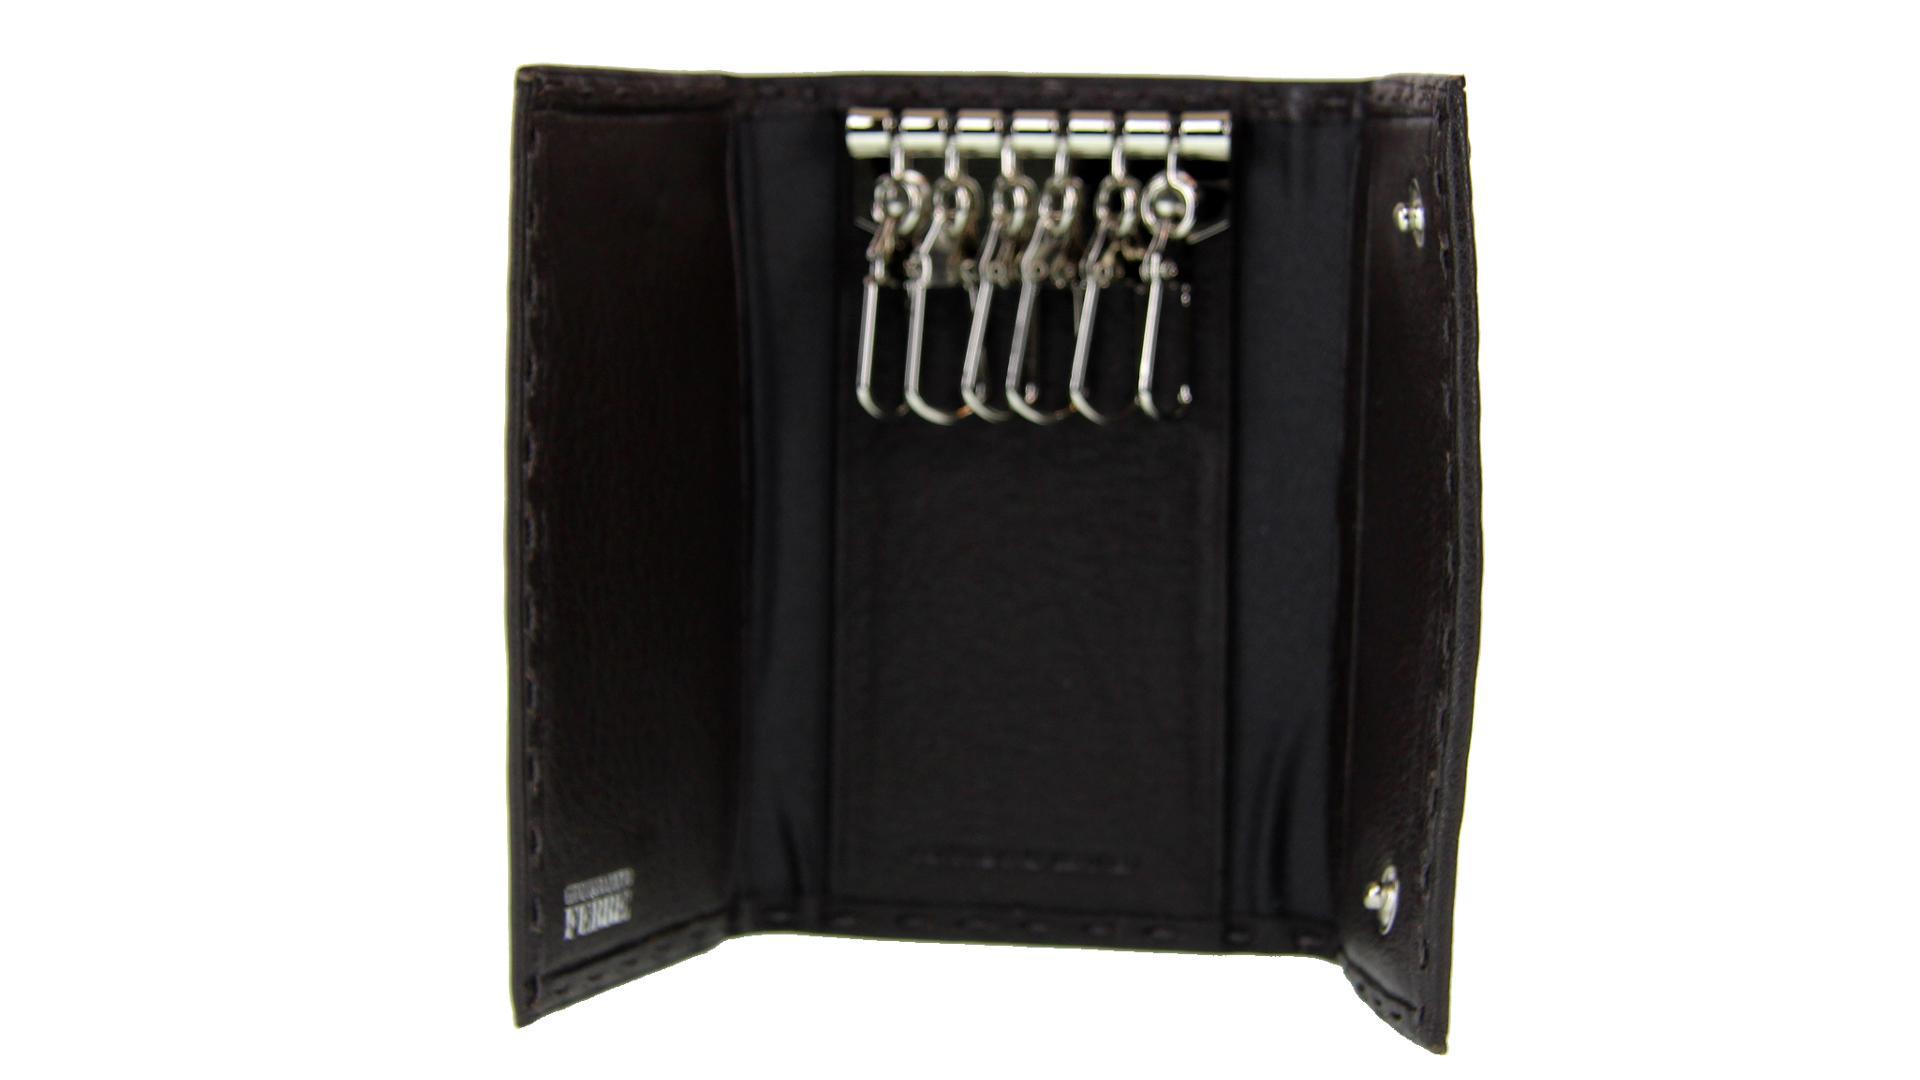 Keys holder  Gianfranco Ferrè  021 003 01 006 Ebano